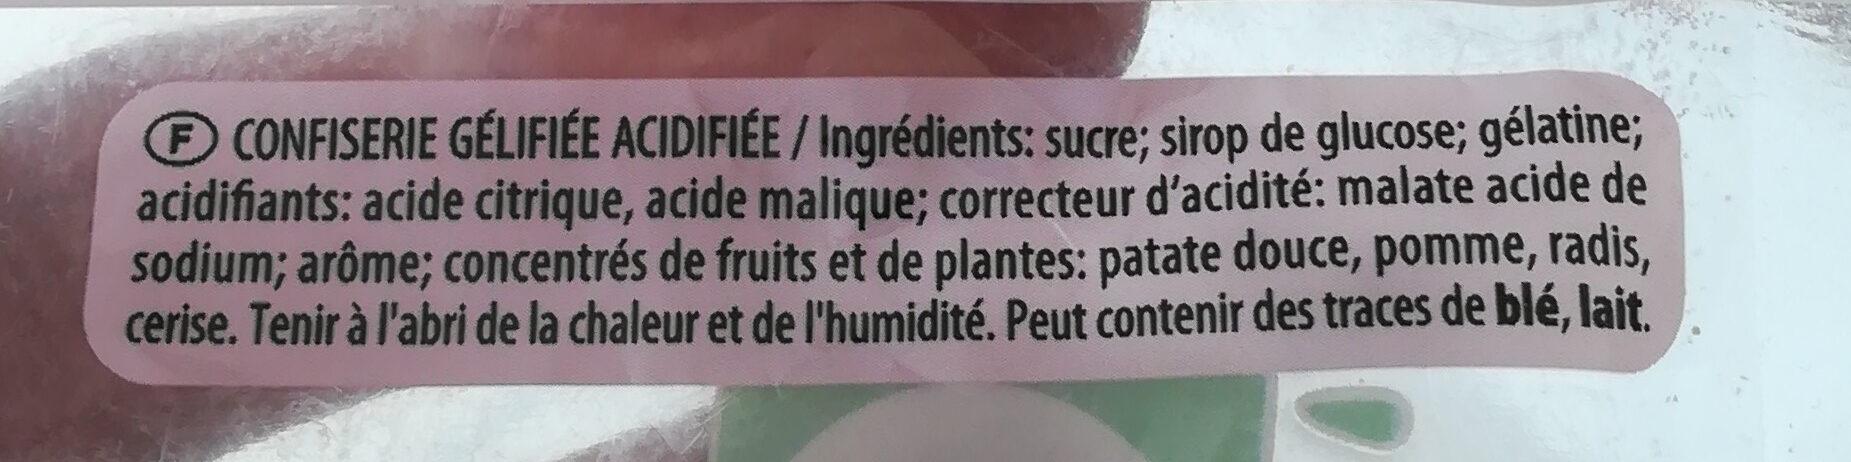 Tagada Pink et pik - Składniki - fr